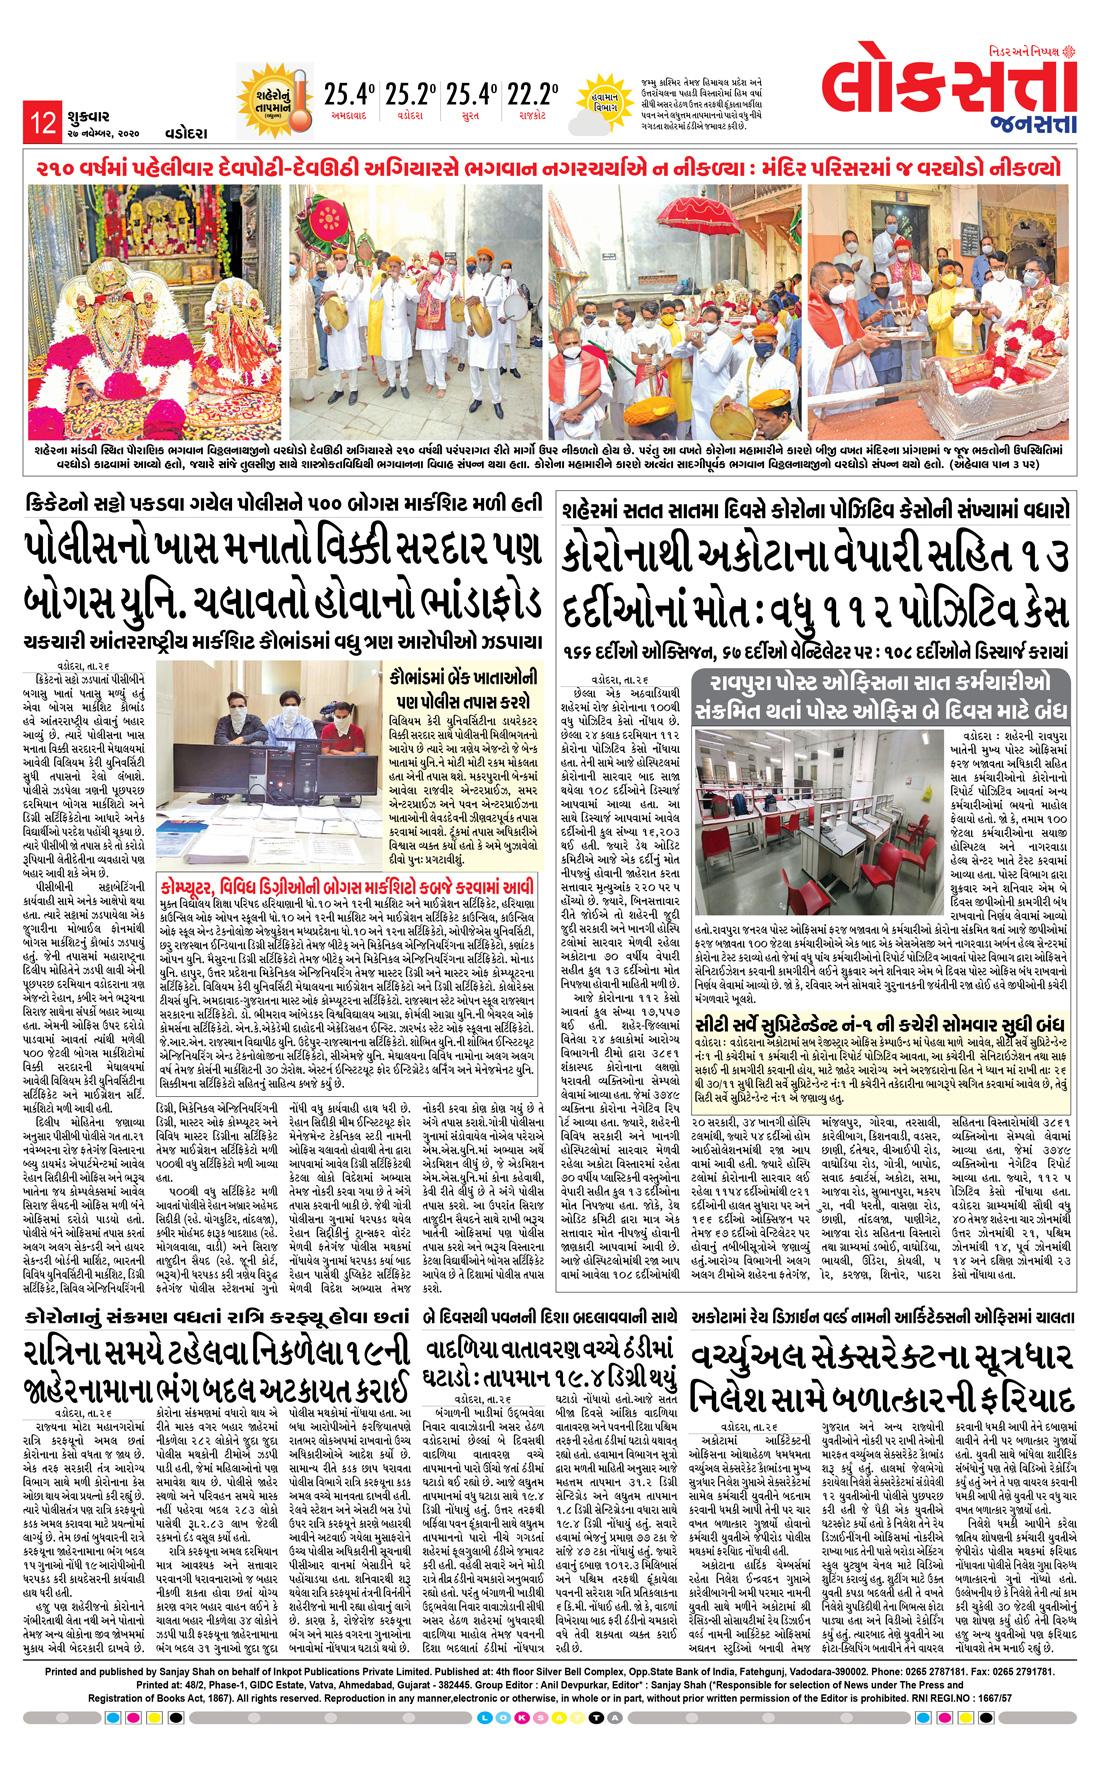 Loksatta Jansatta News Papaer E-paper dated 2020-11-27 | Page 13